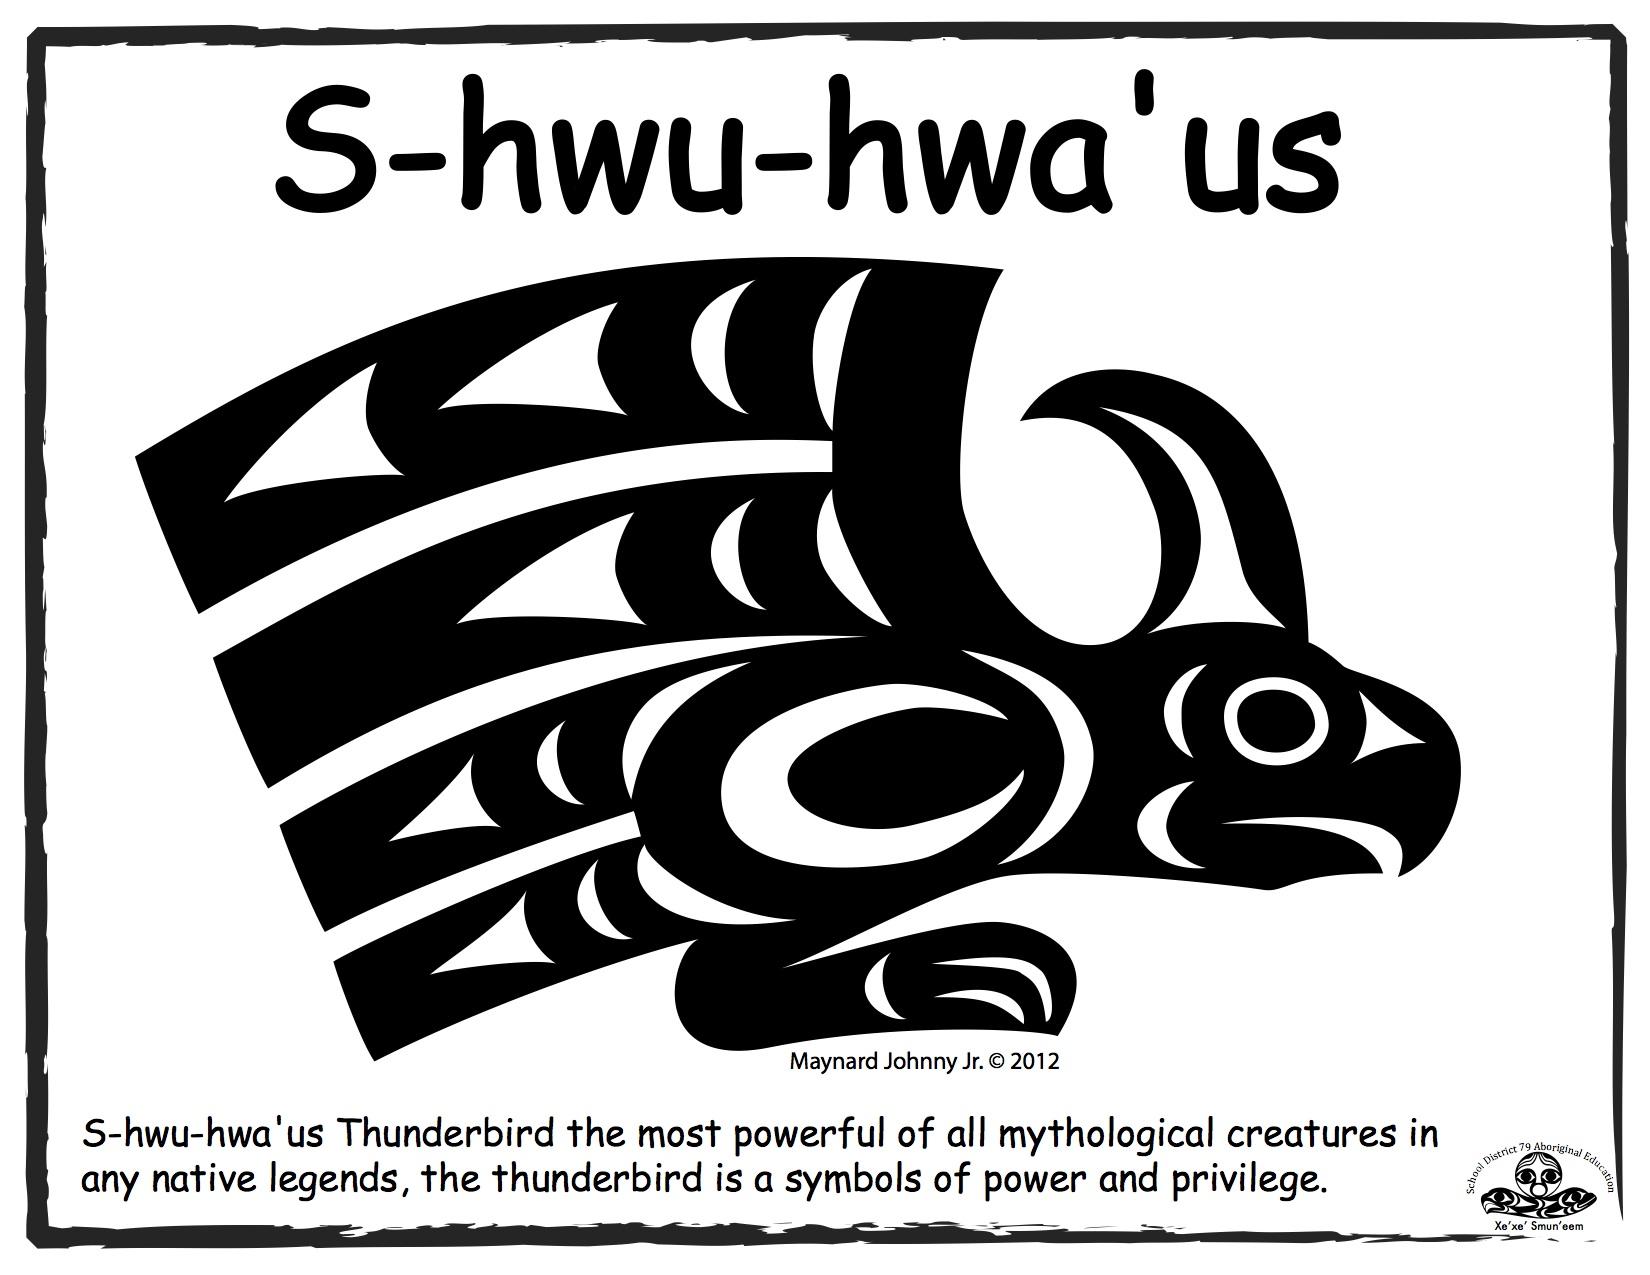 thunderbird-s-hwu-hwaus